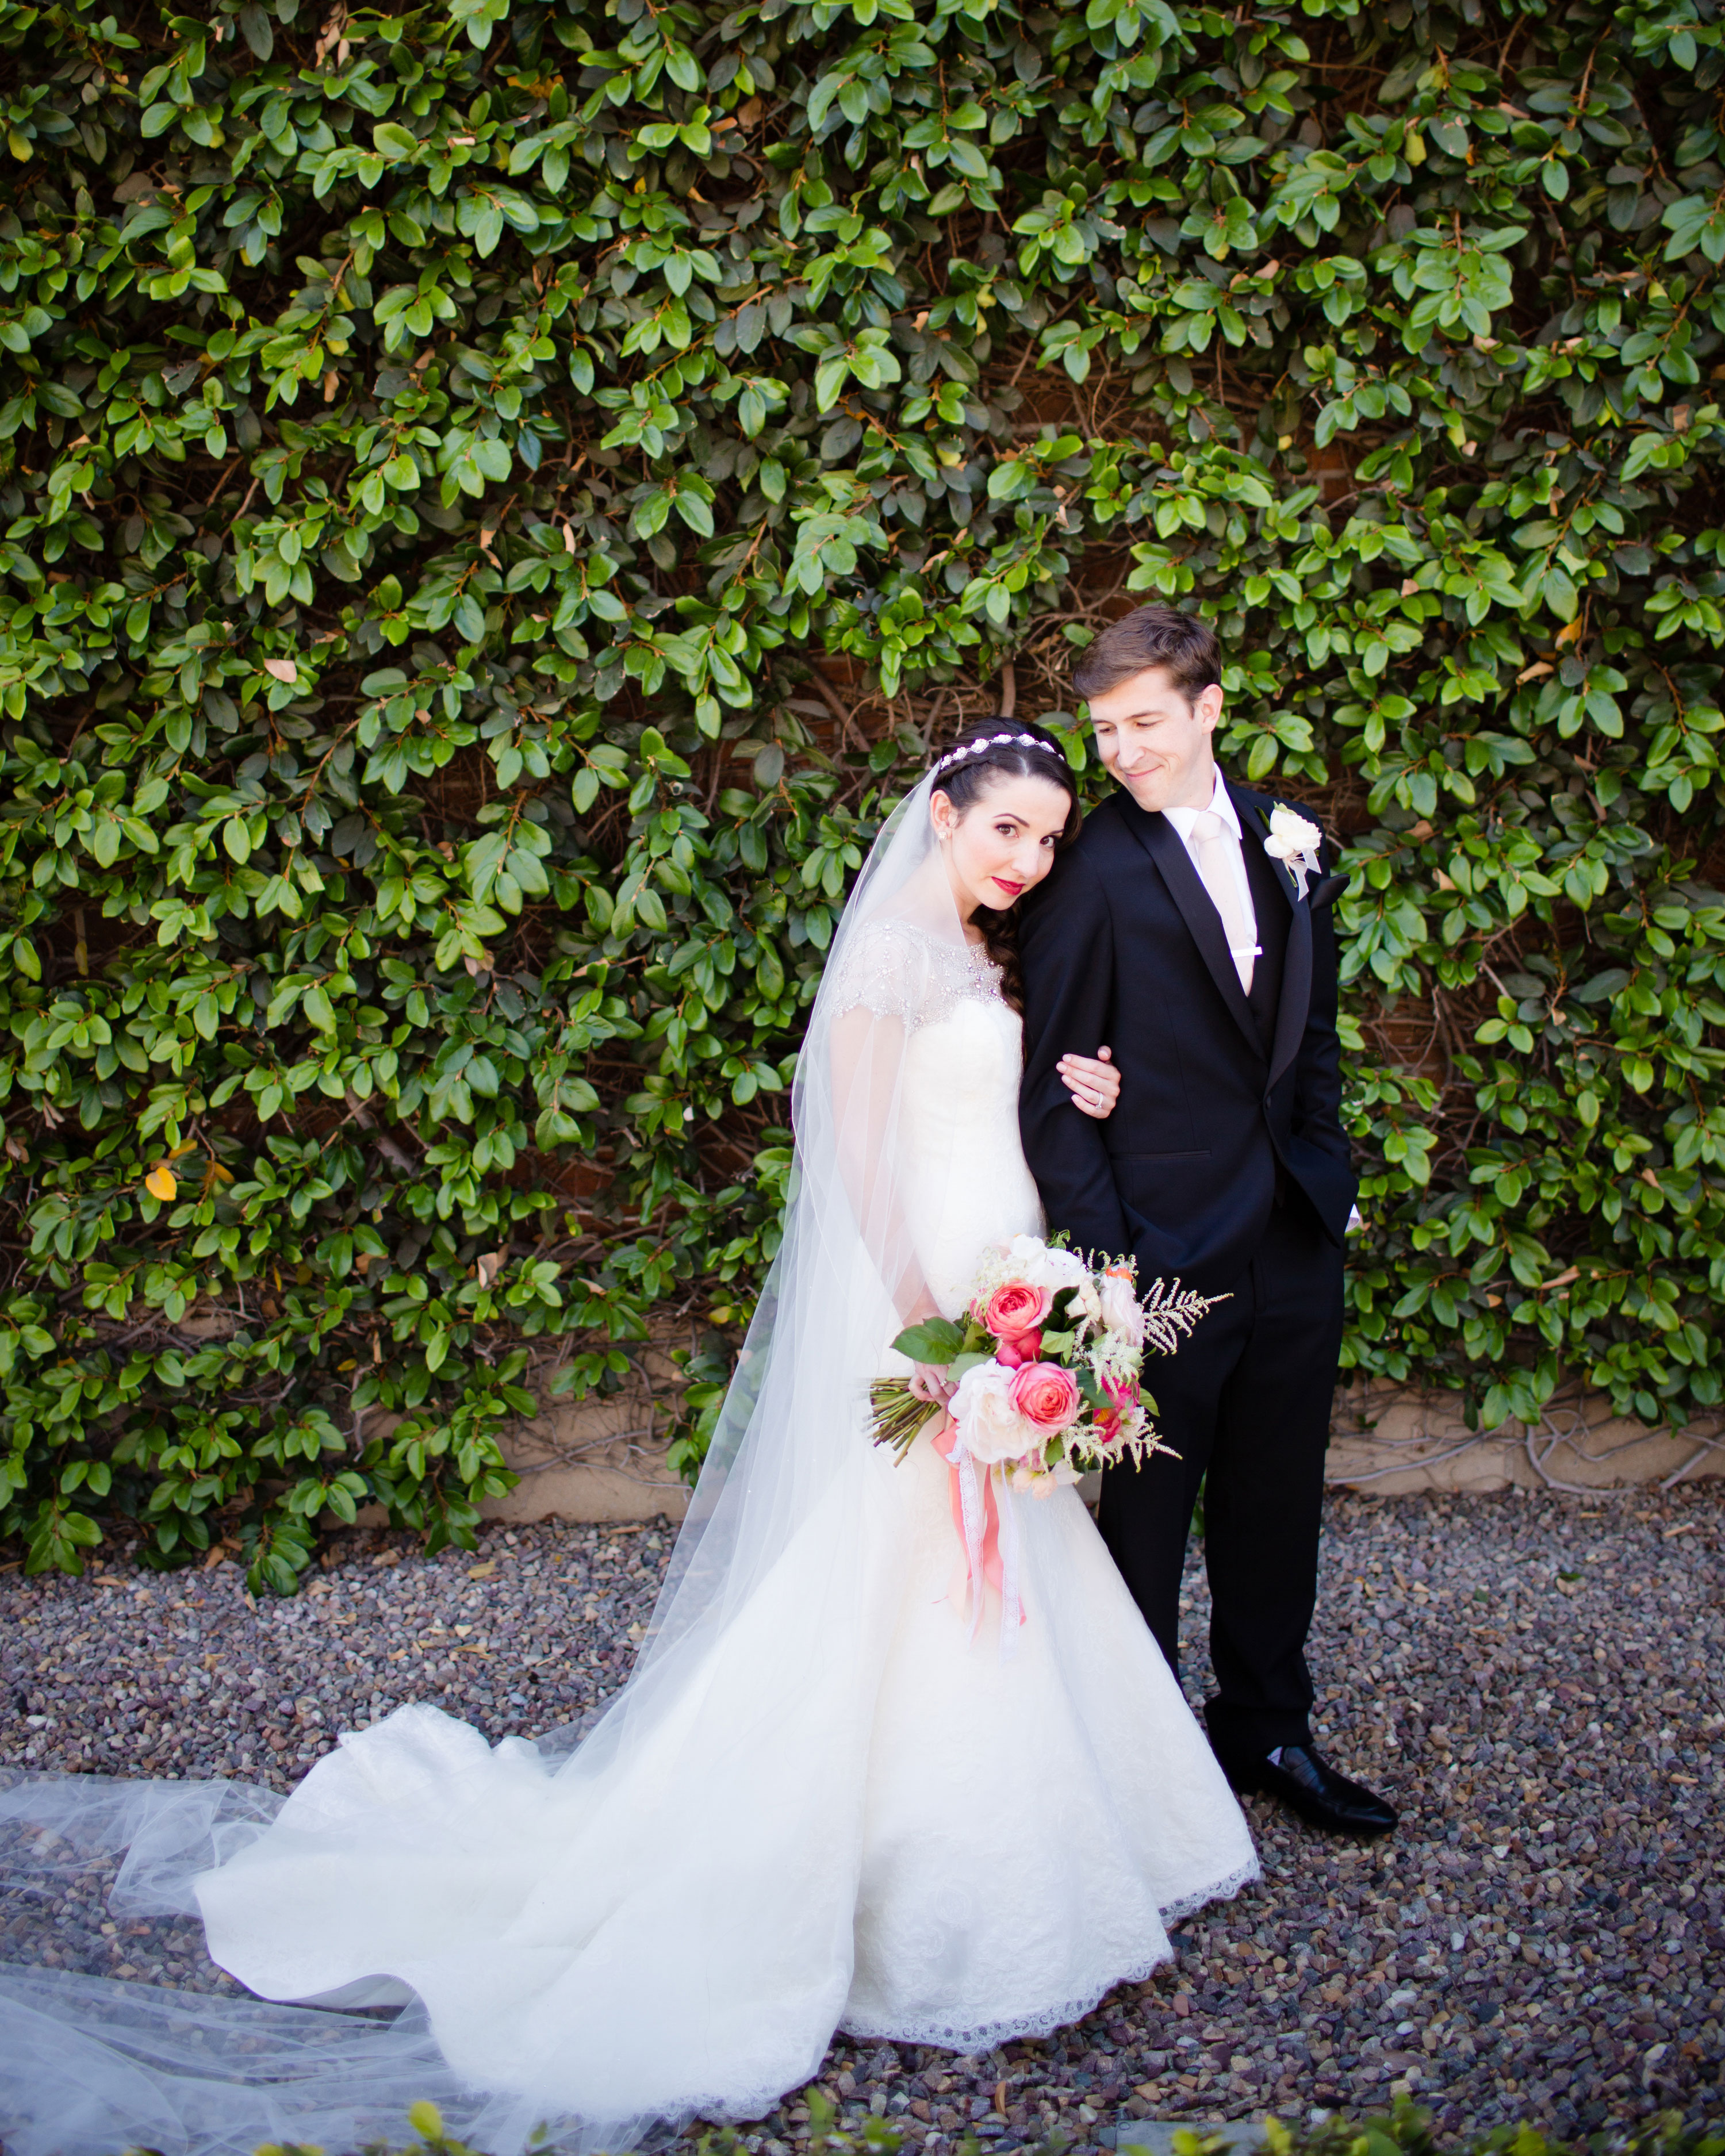 richelle-tom-wedding-couple-396-s112855-0416.jpg